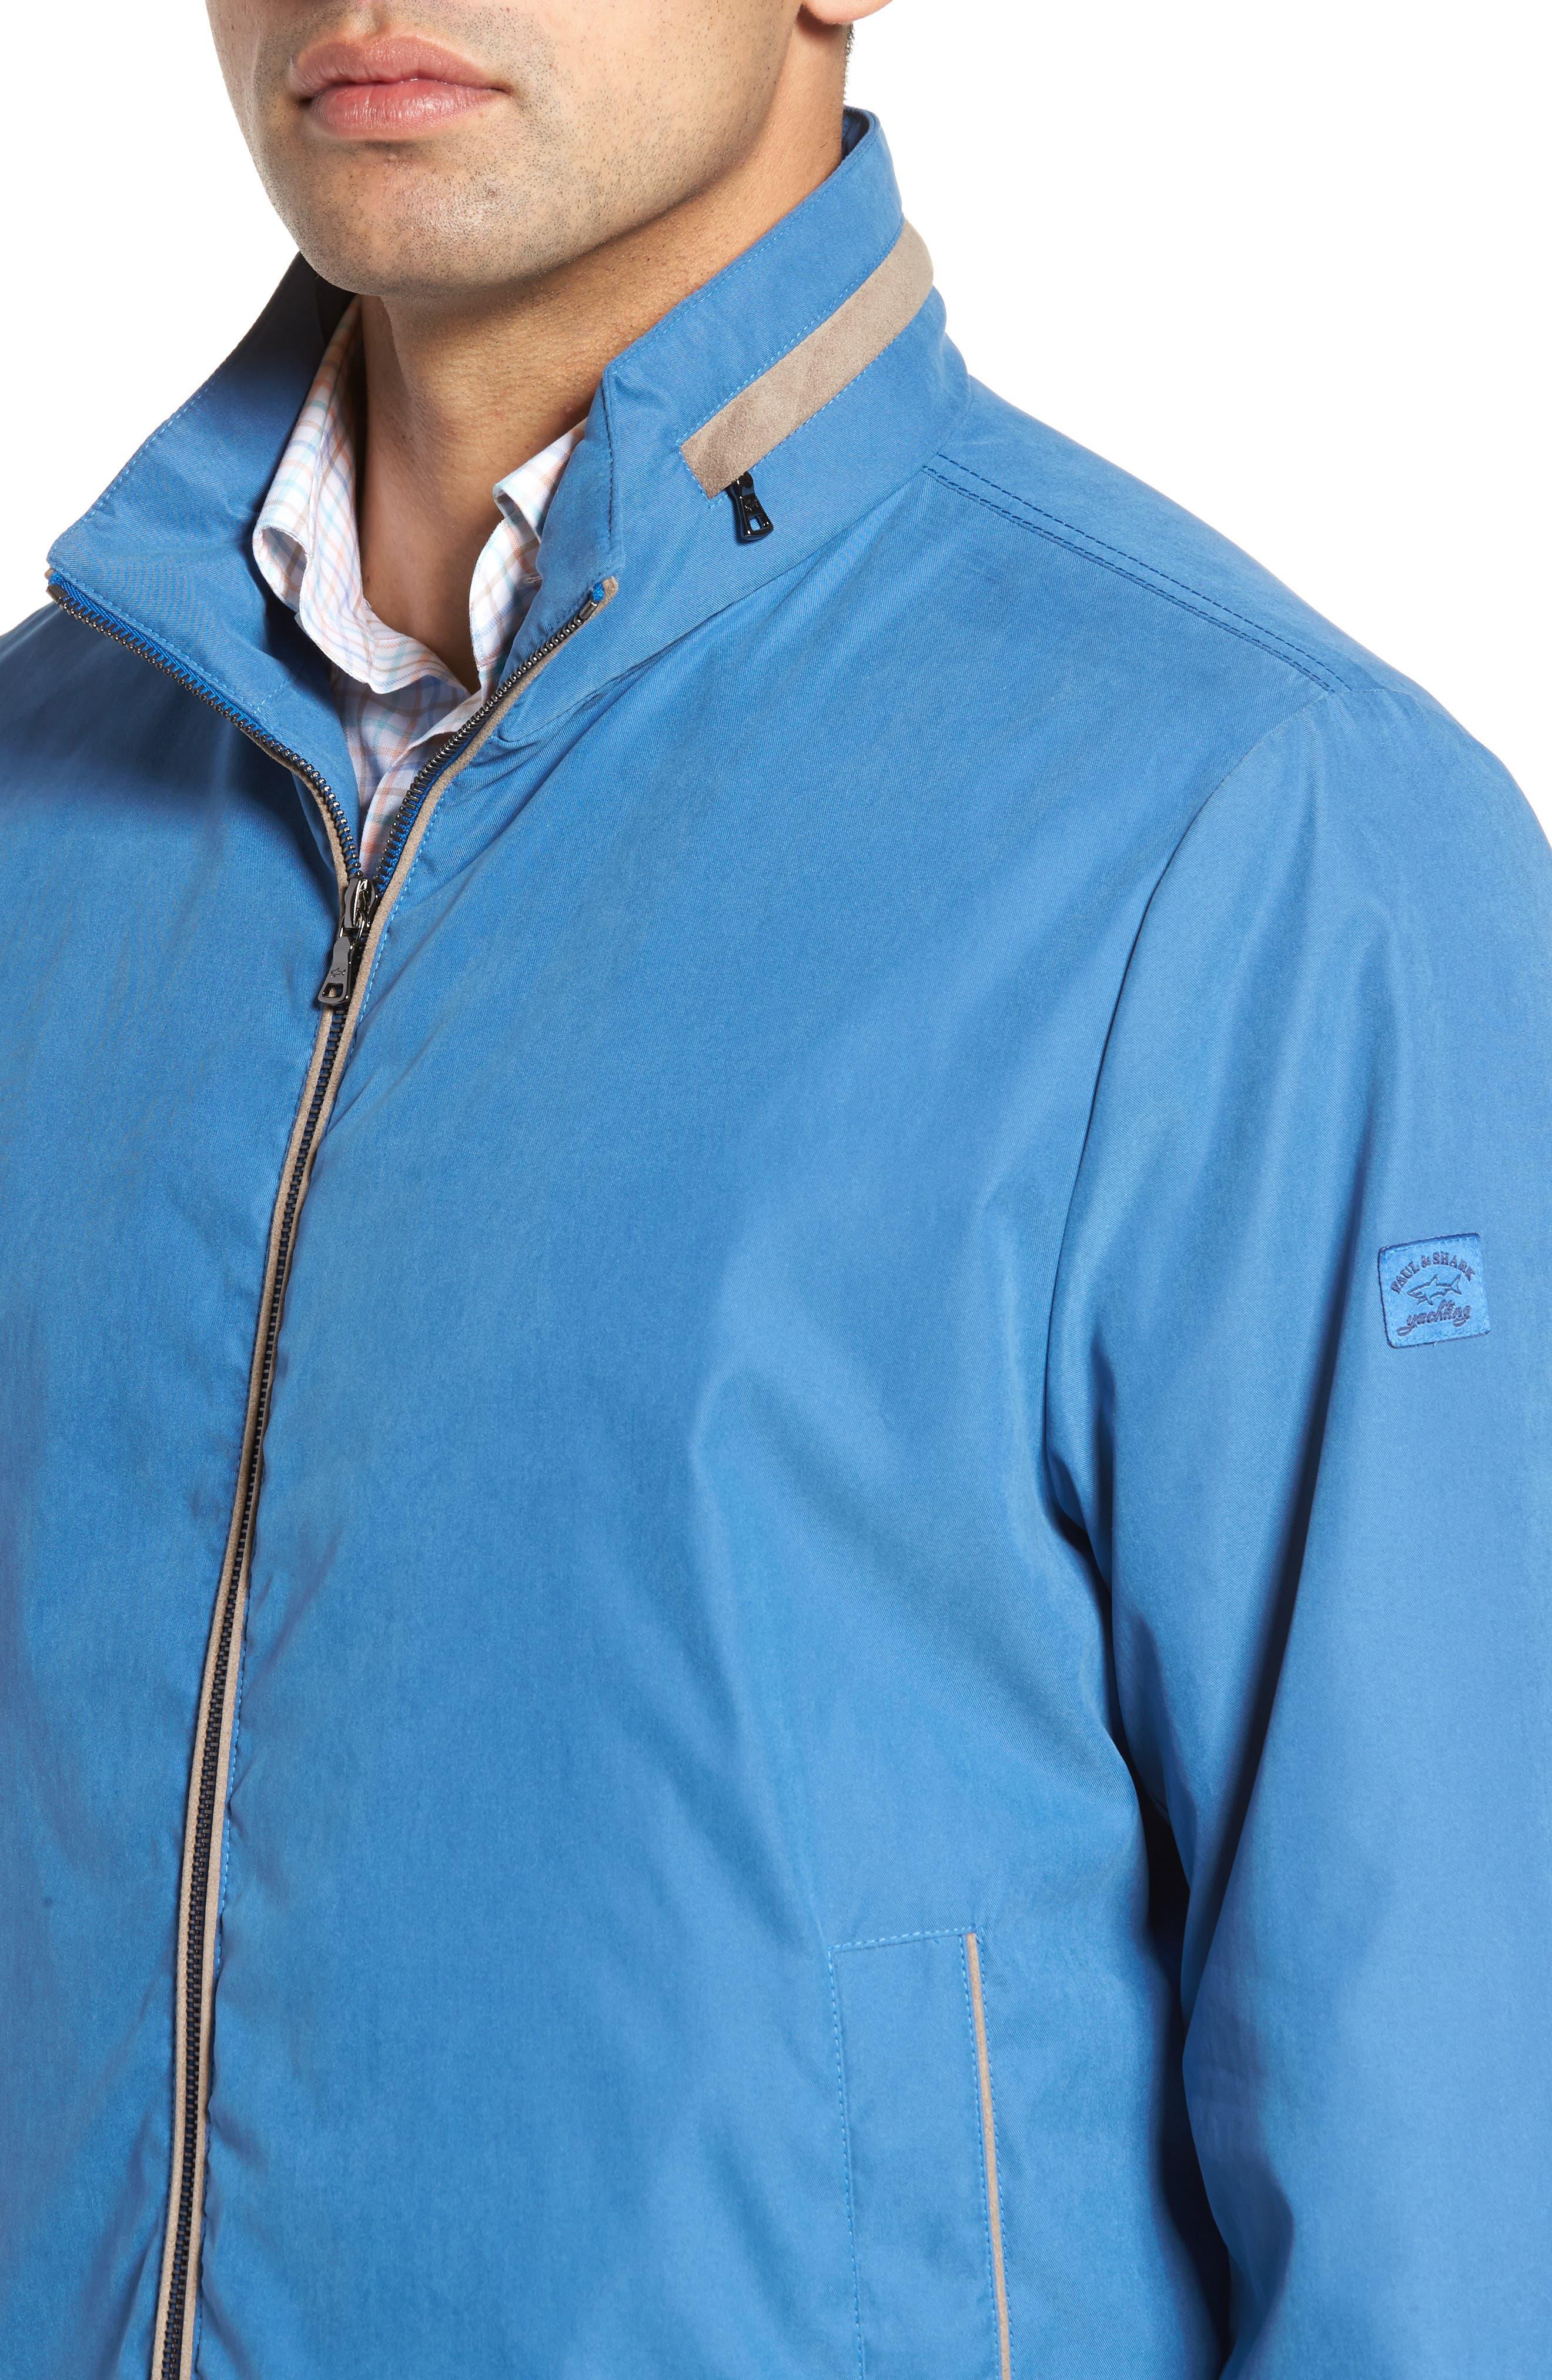 Paul&Shark Water Repellent Microfiber Jacket,                             Alternate thumbnail 4, color,                             Blue